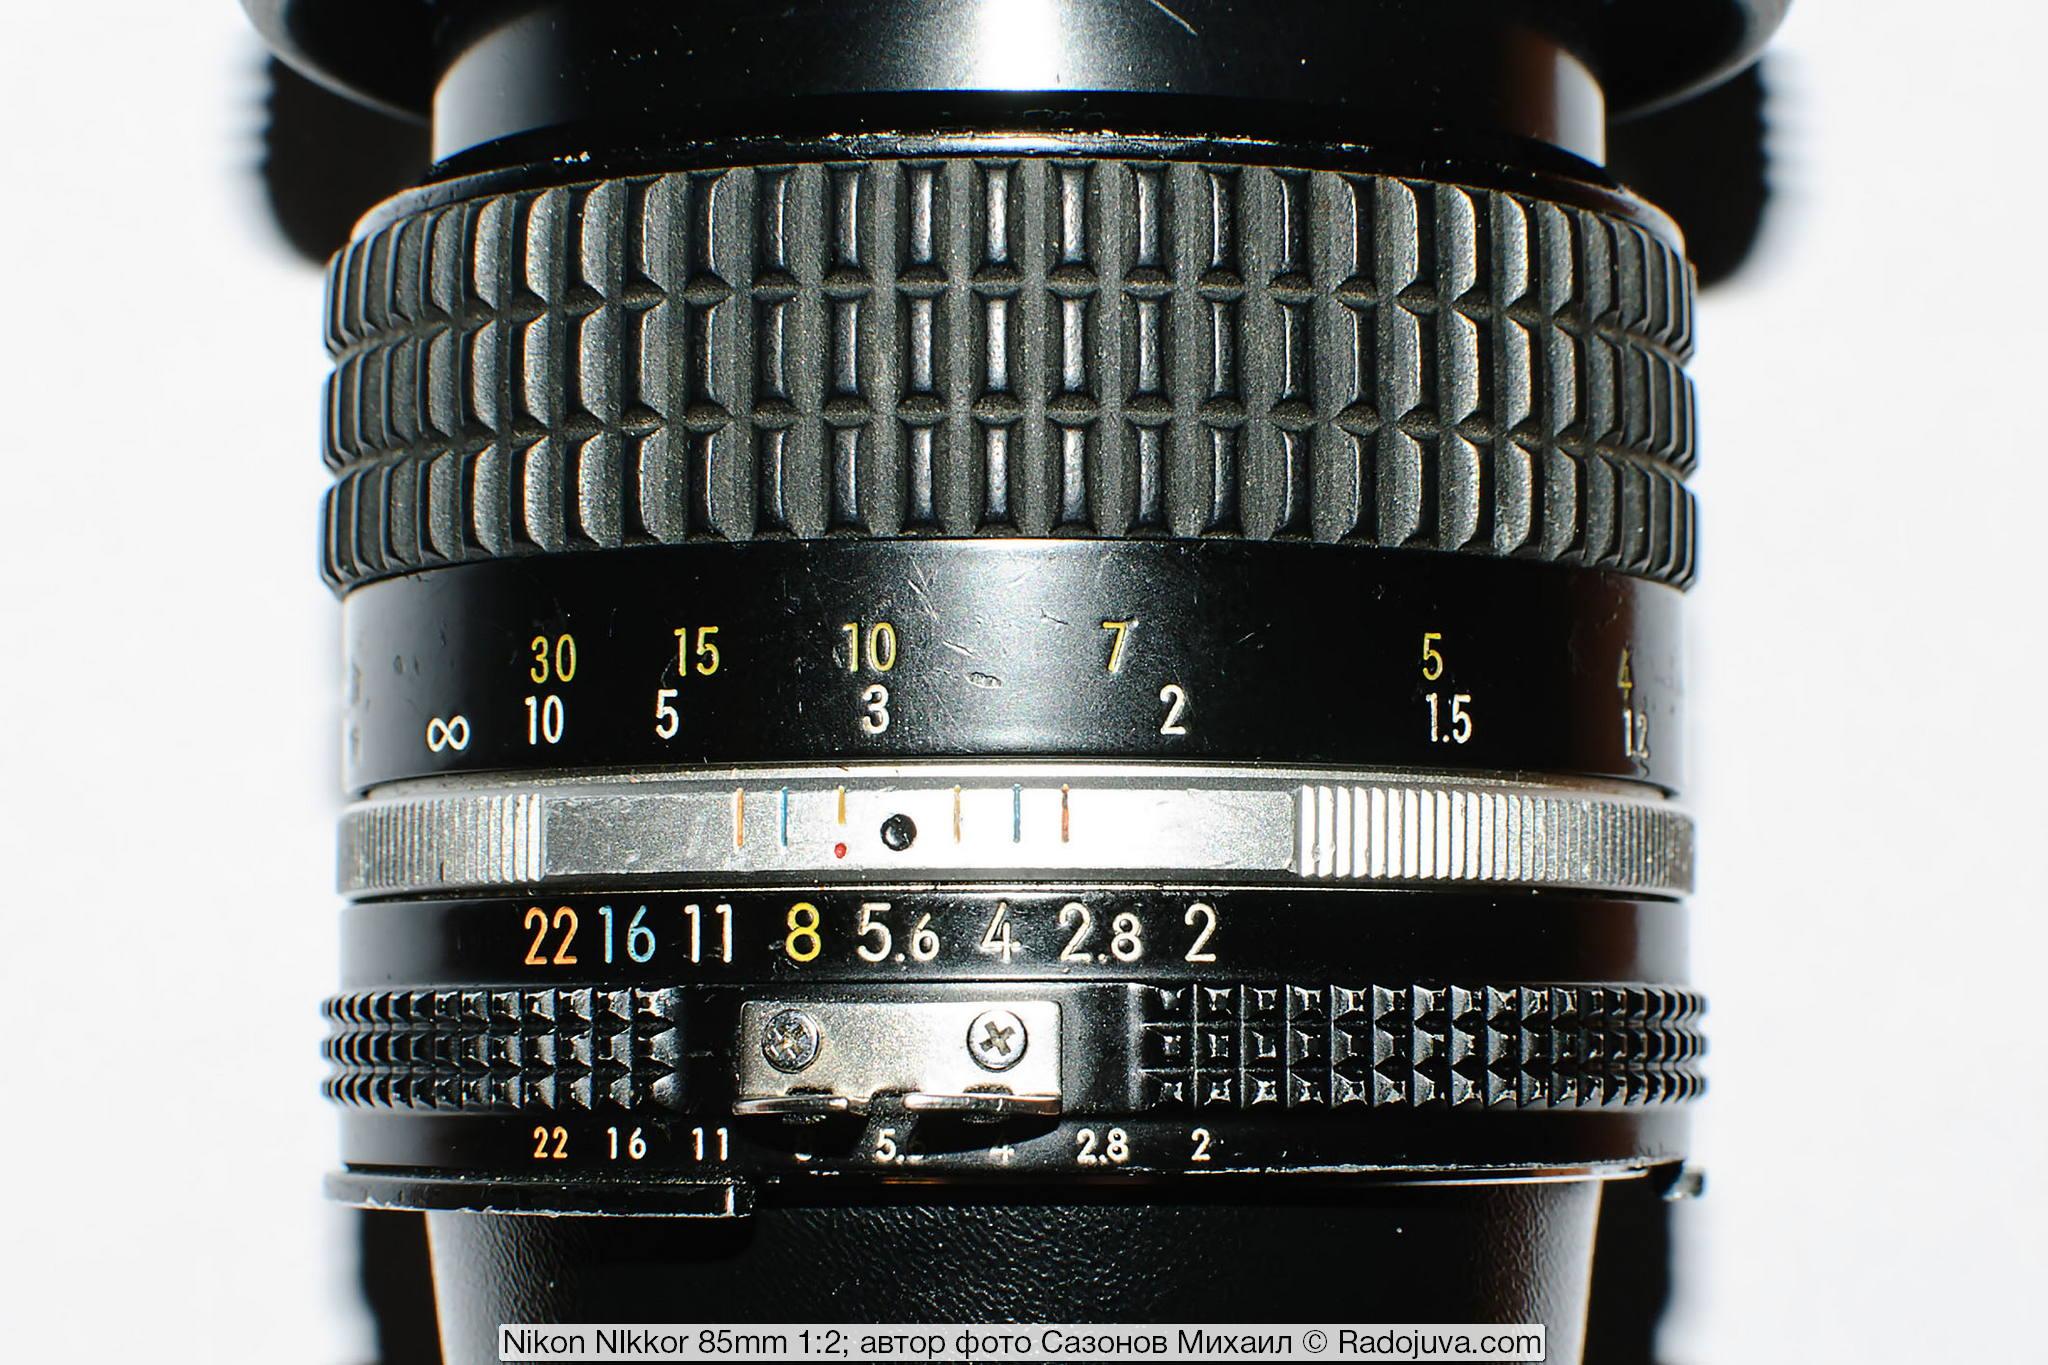 Nikon NIkkor 85mm 1:2 (AI-S)